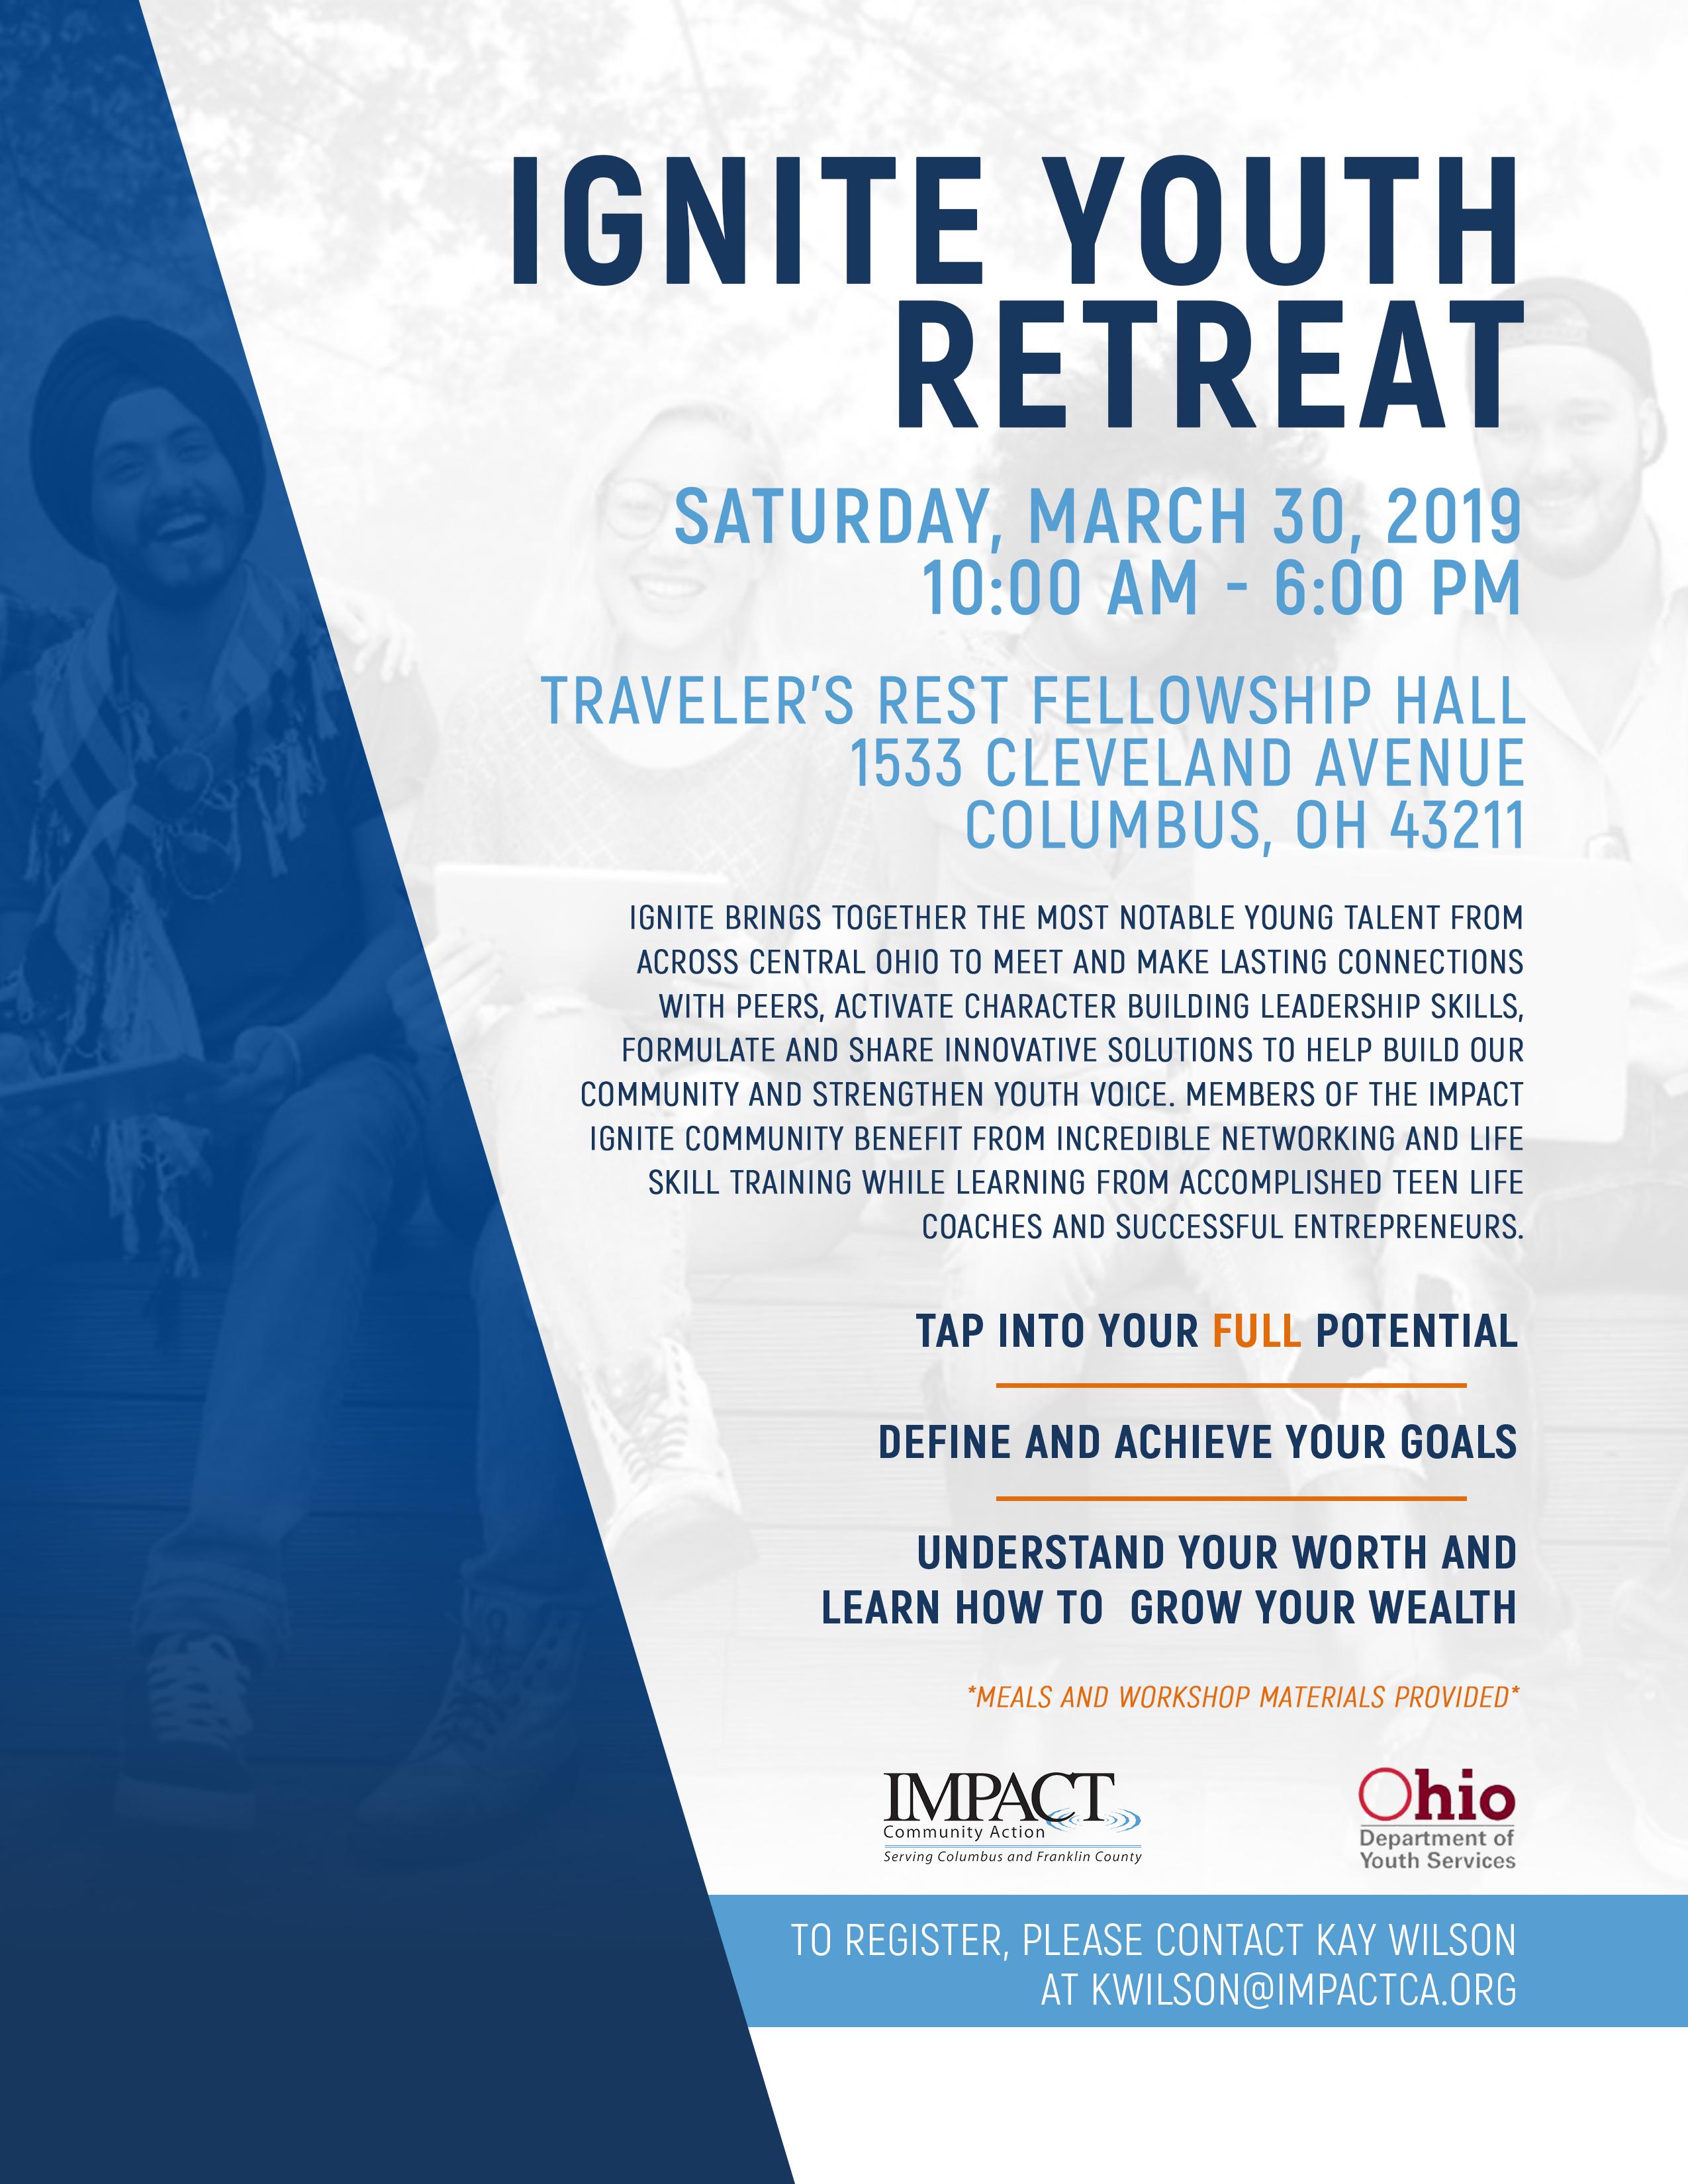 Ignite Youth Retreat